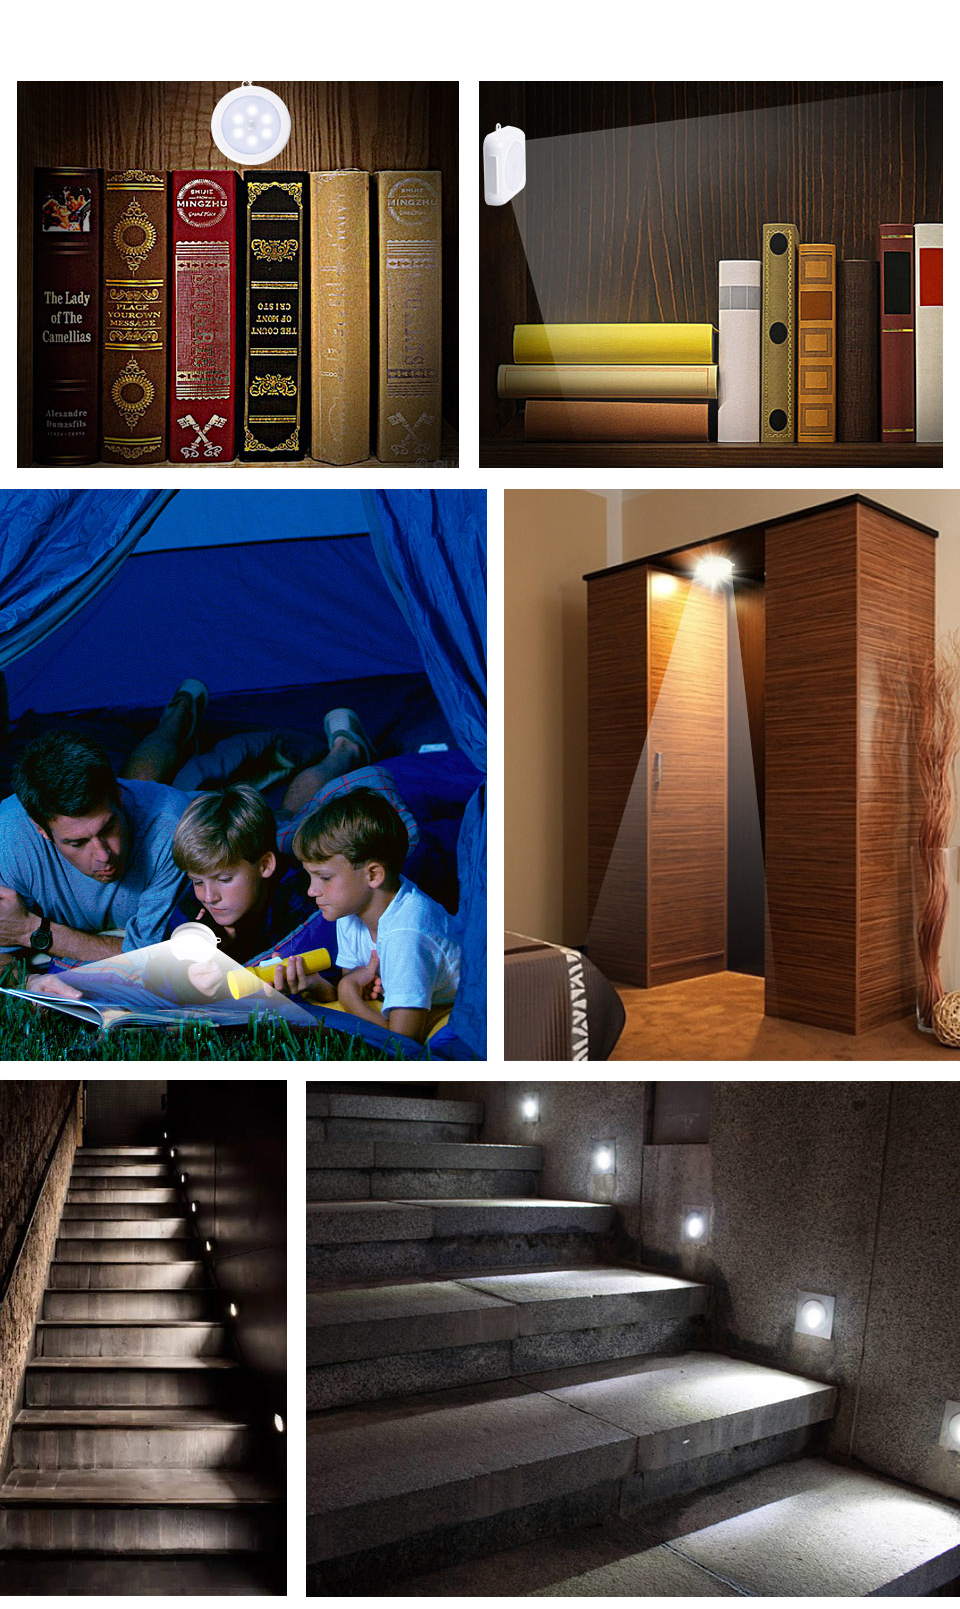 6LEDs Wireless PIR Auto Motion Sensor Infrared Night Light Cabinet Stair Lamp pw